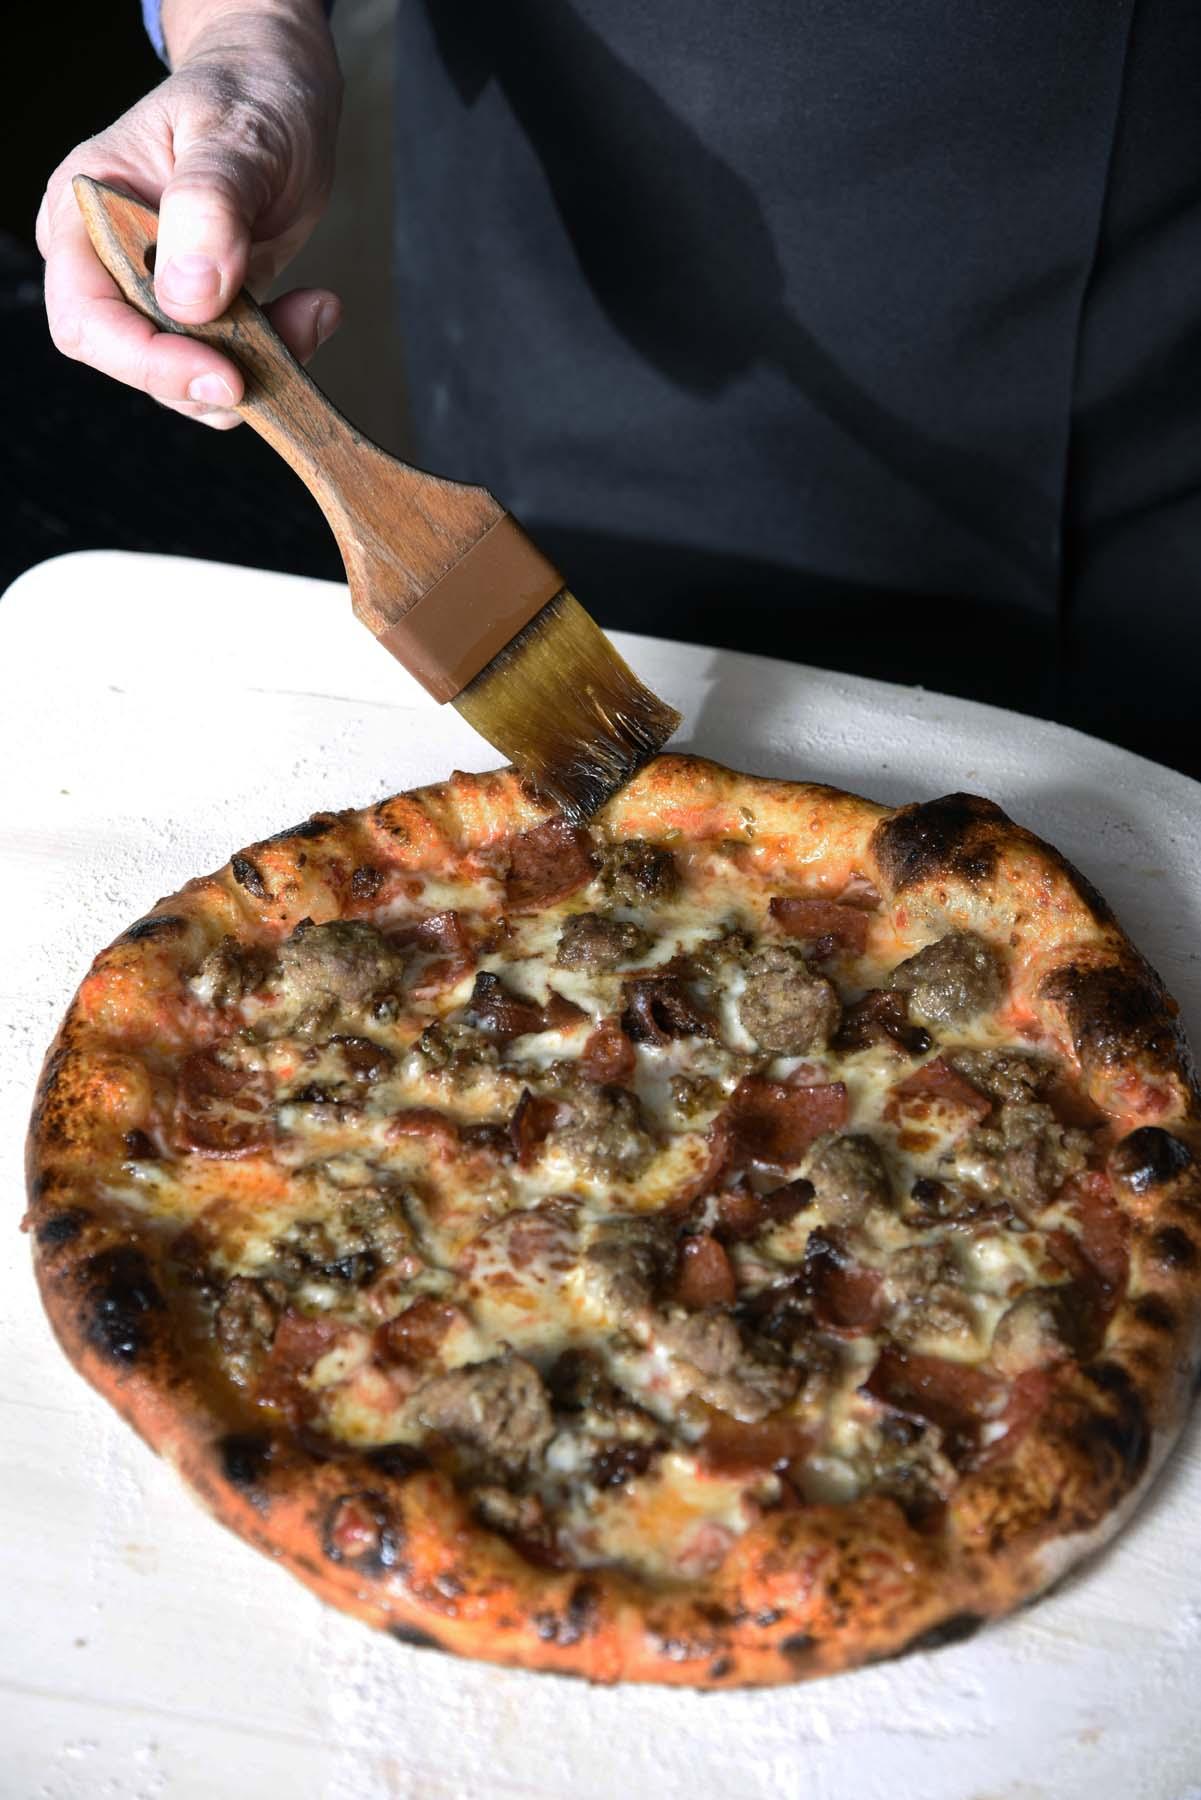 Coals-Artisan-Pizza-Louisville35.jpg